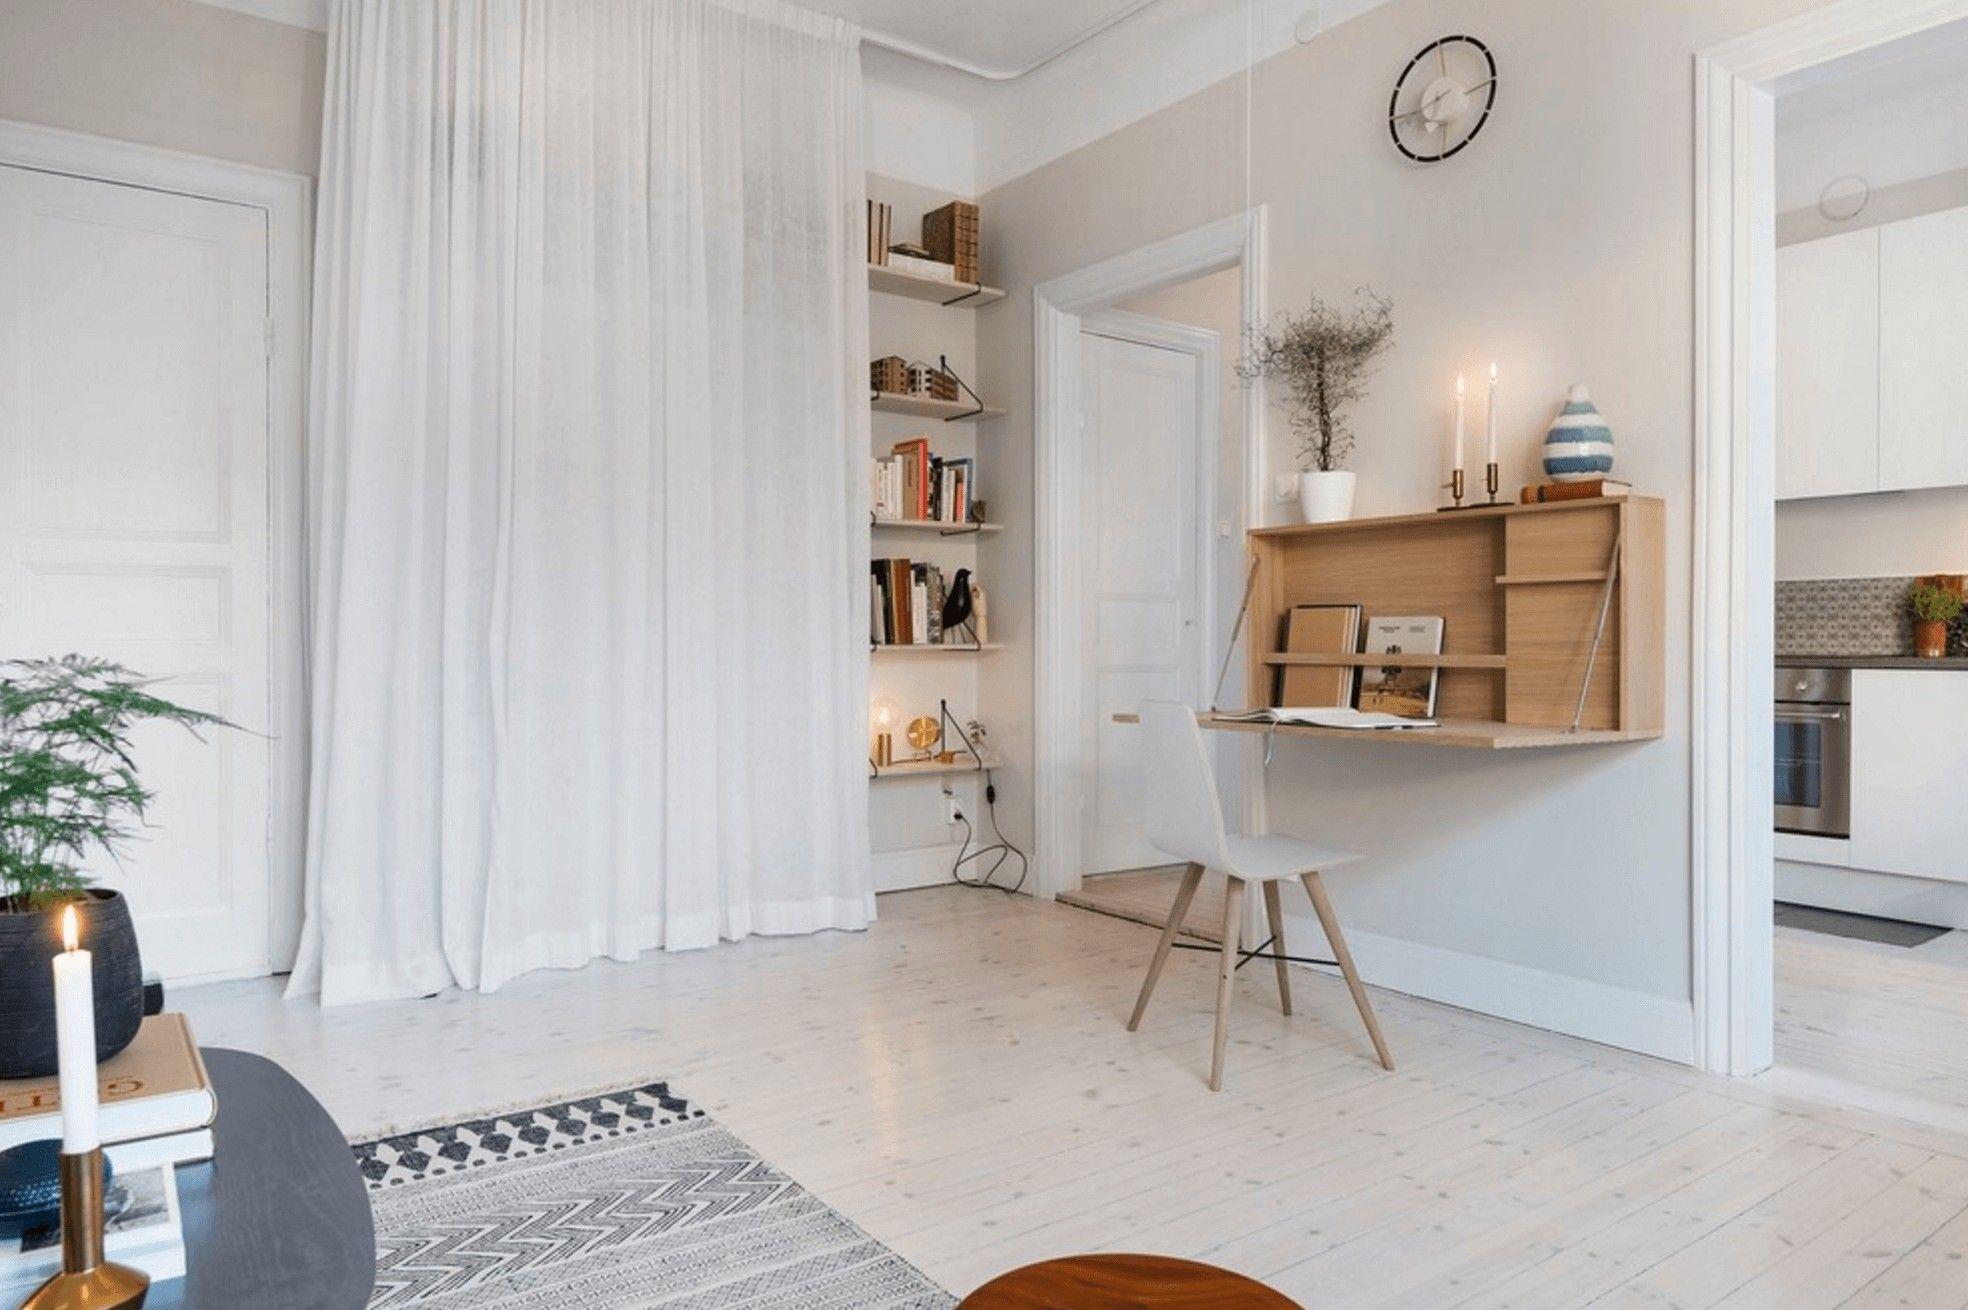 Curtain hiding a bookshelf Scandinavian interior design